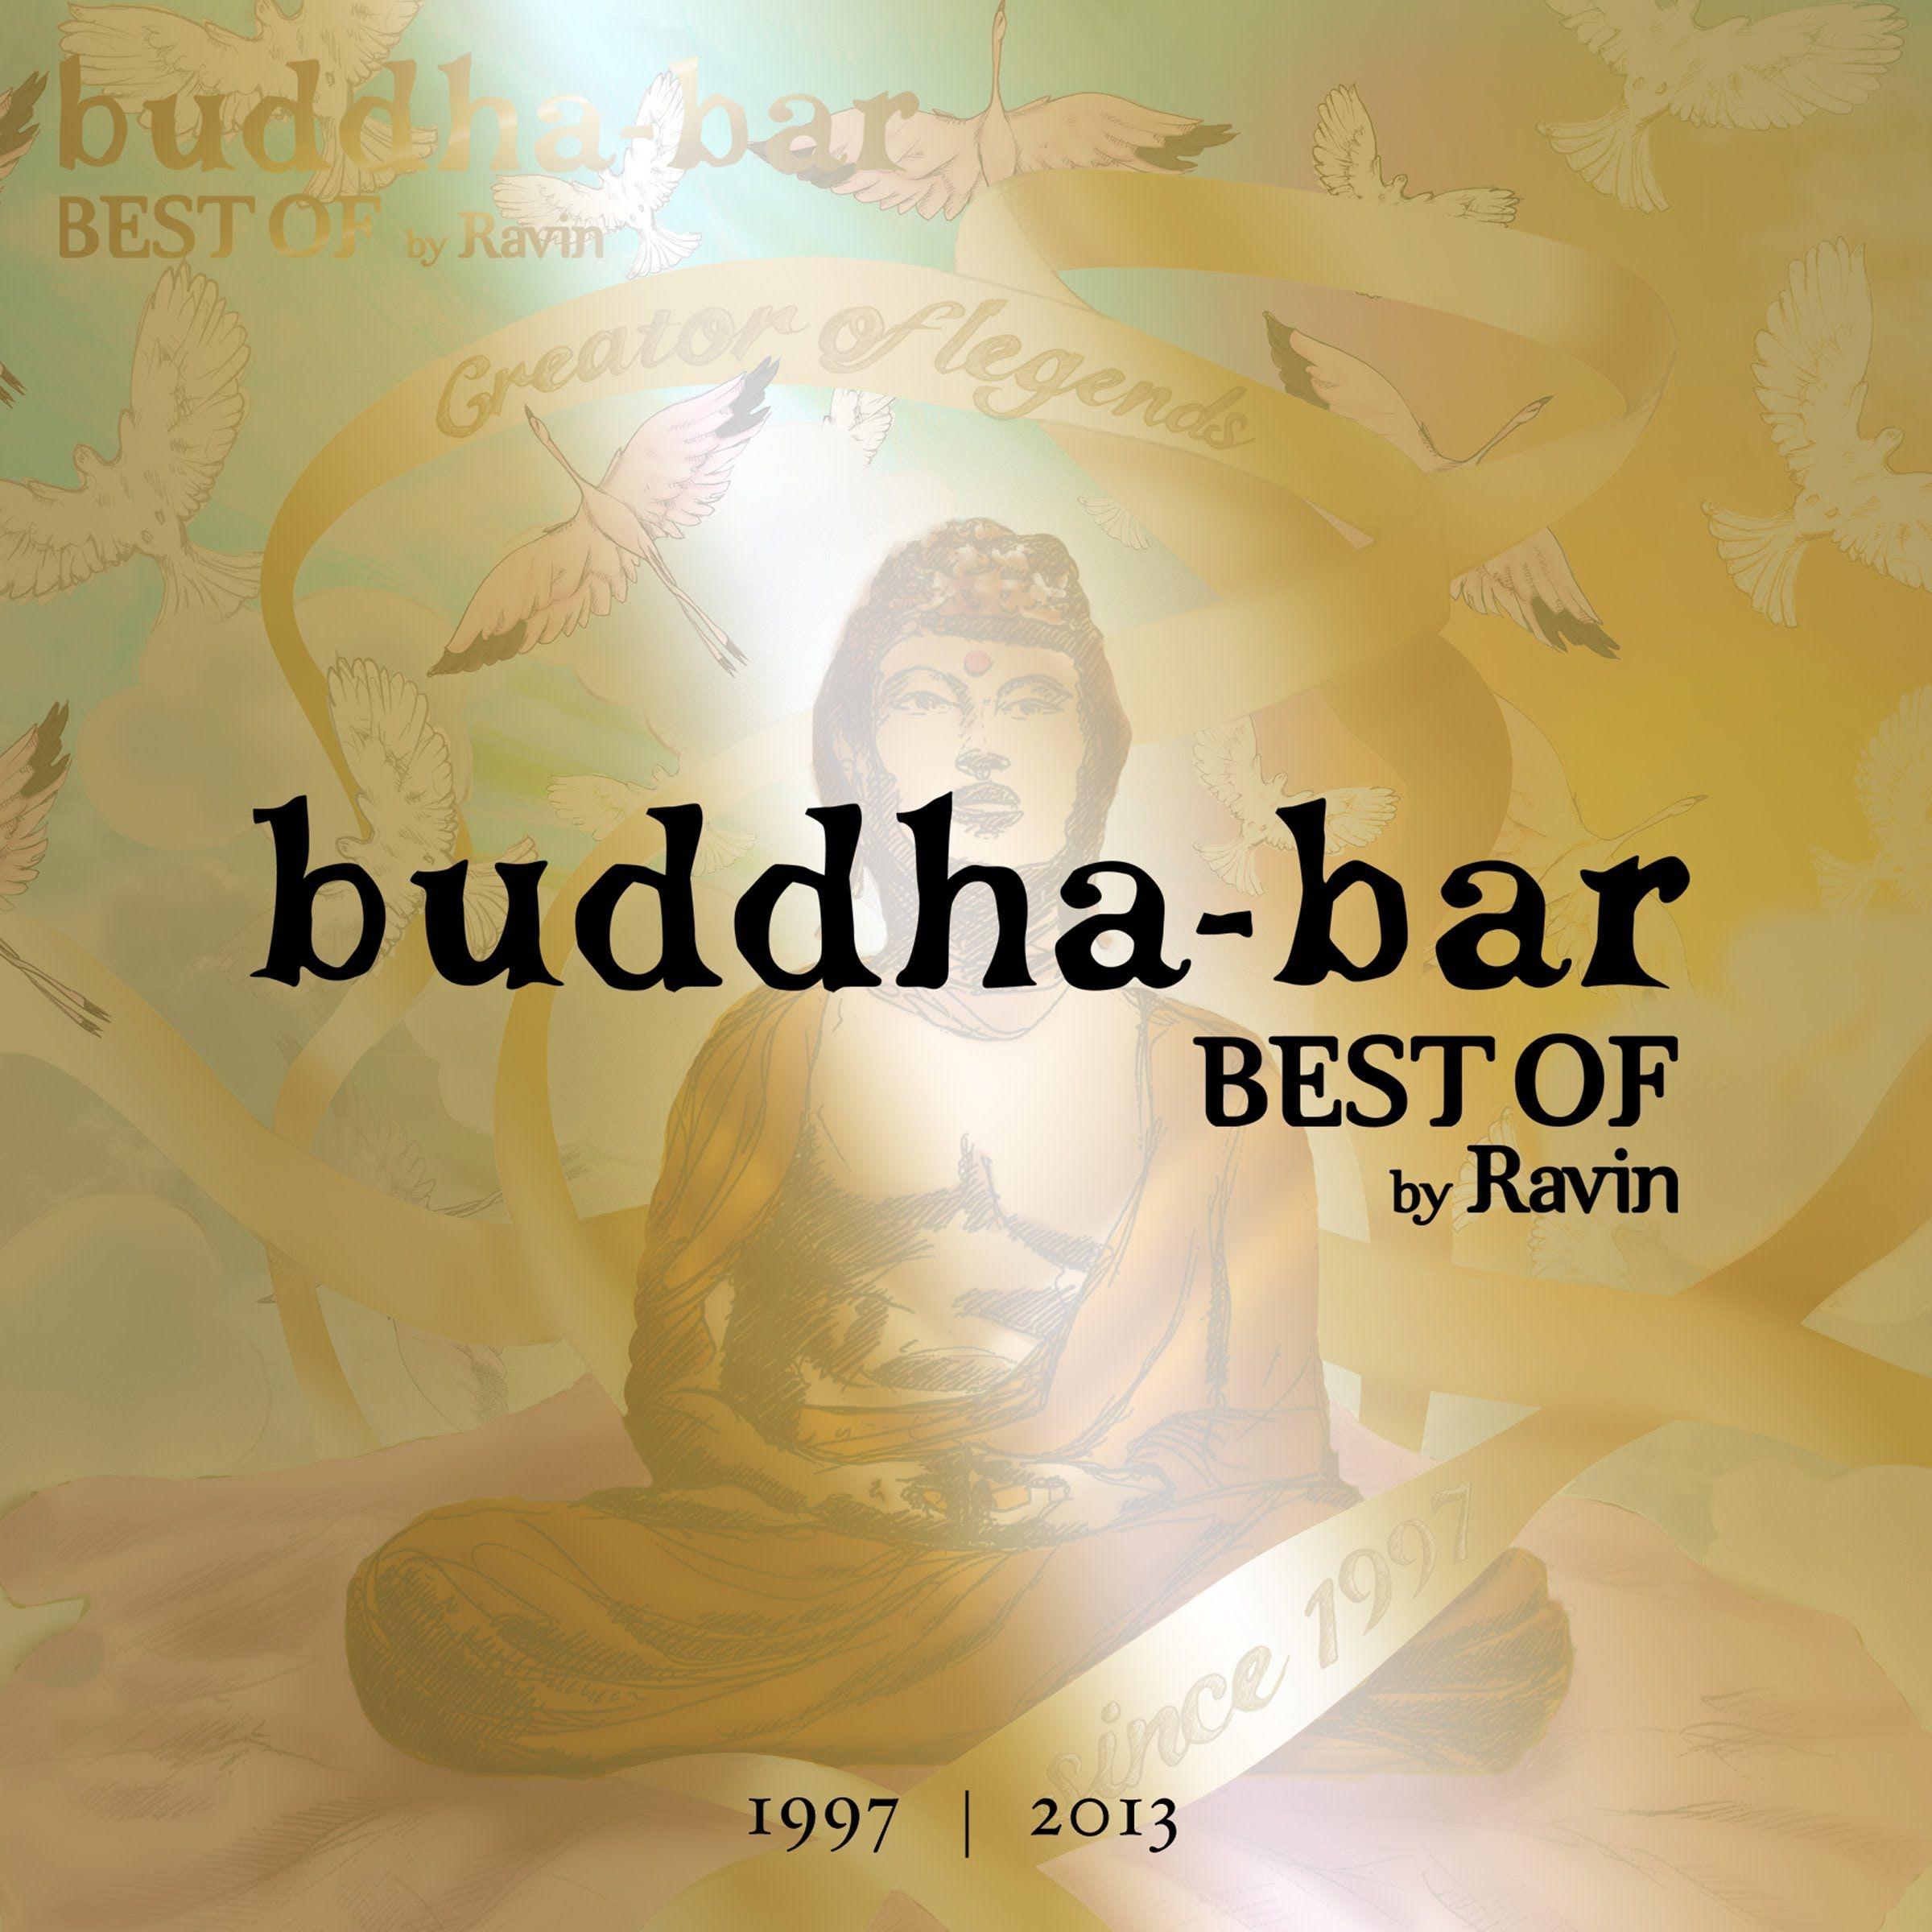 Buddha Bar Best Of Trailer 1 Alihan Samedov Sen Gelmez Oldun Muziek